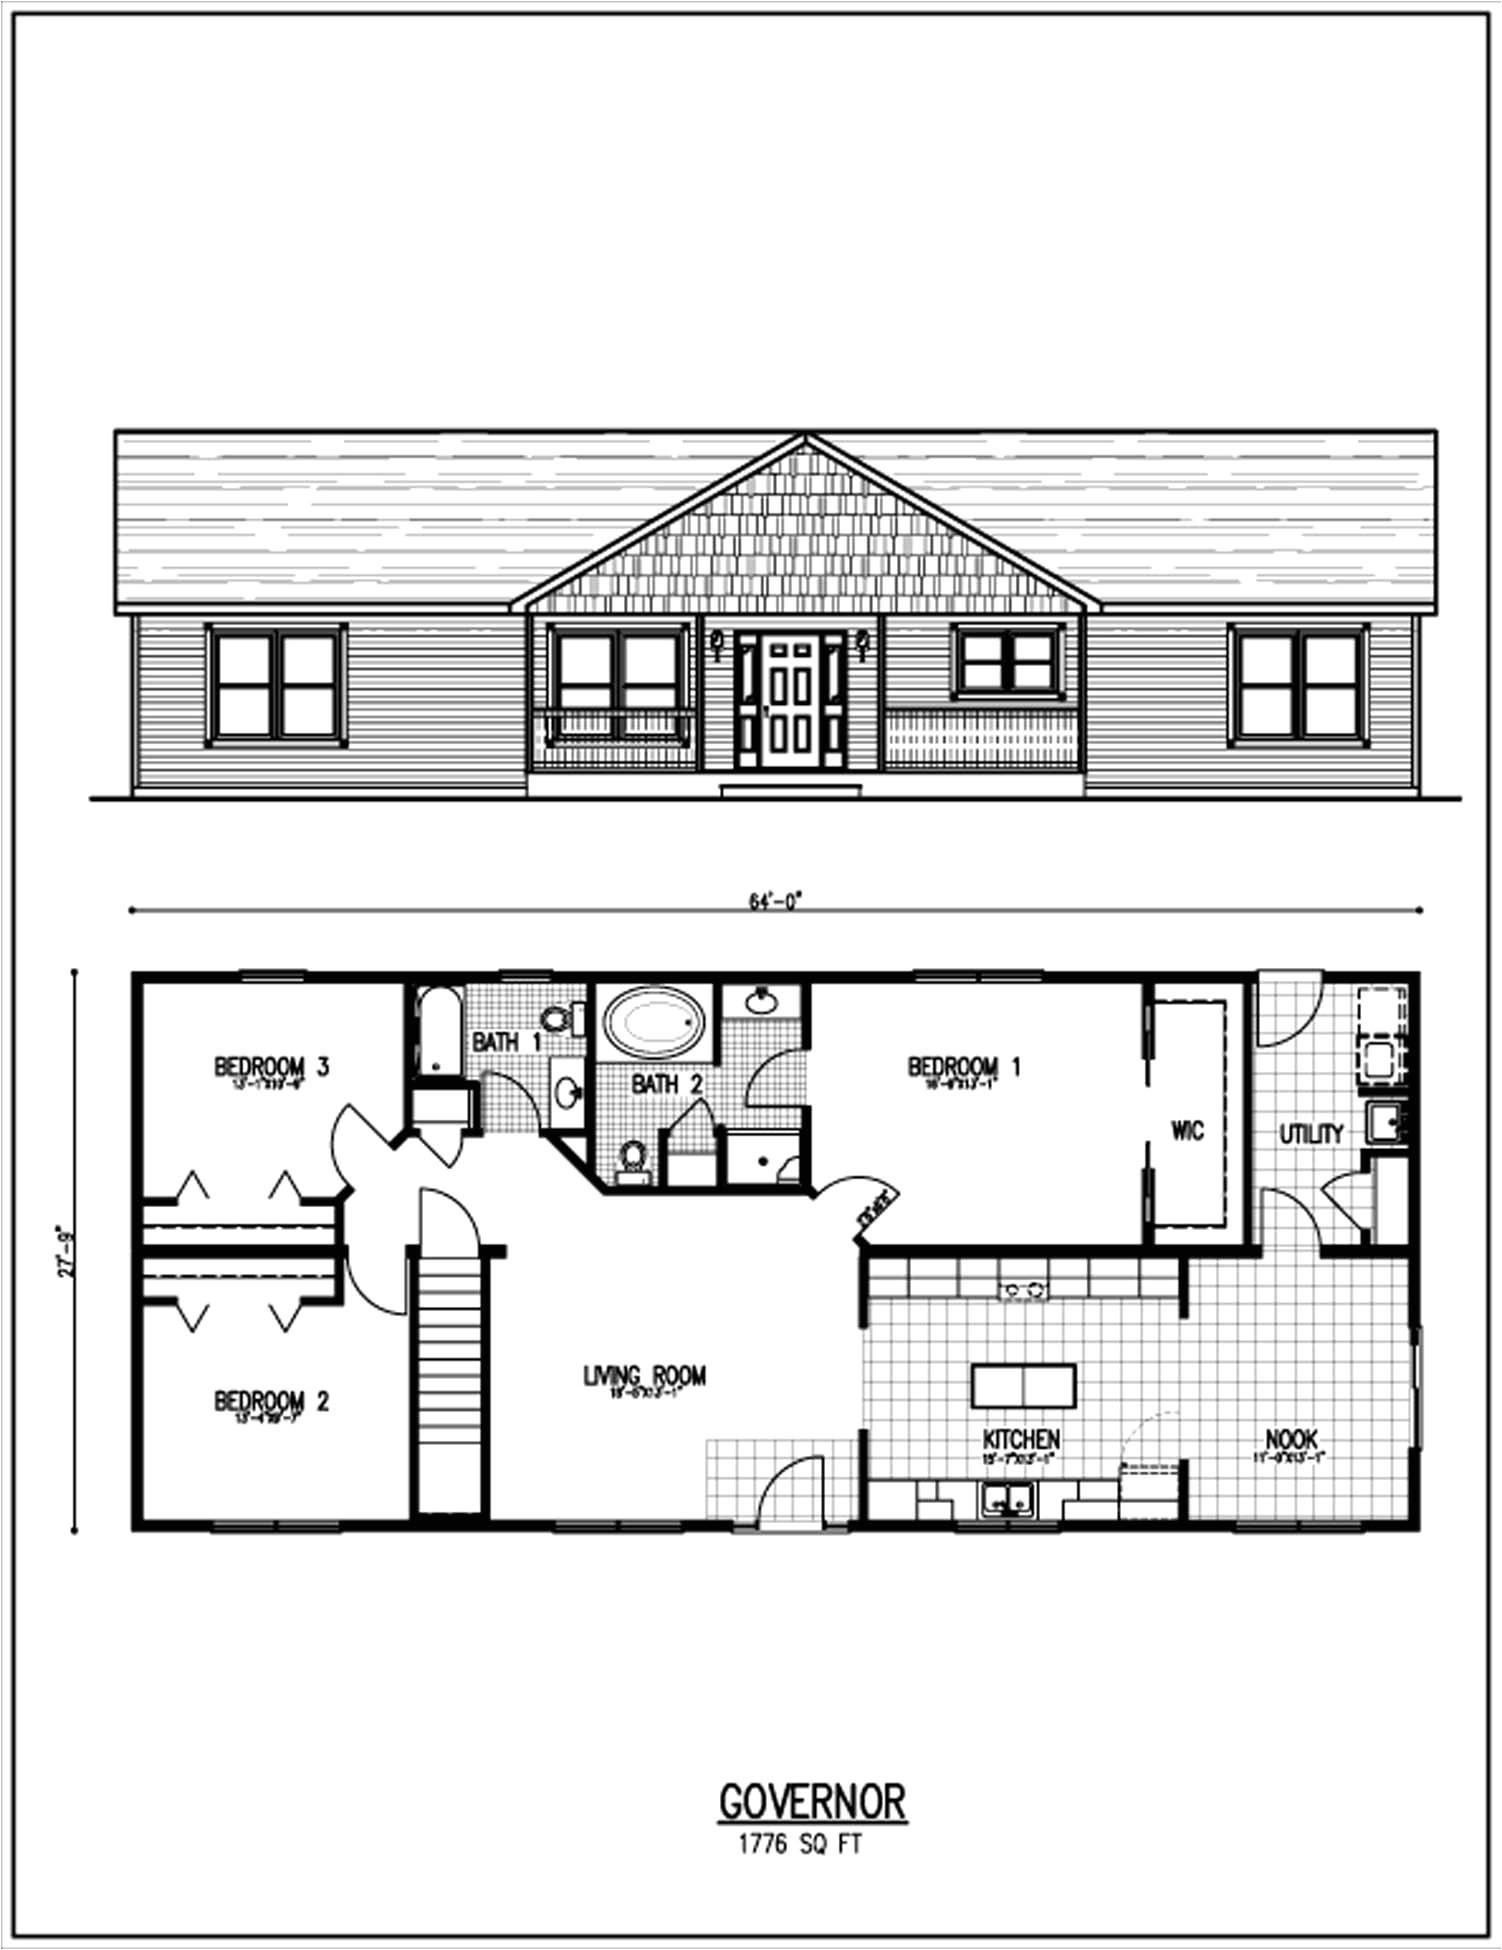 Monster Mansion Mobile Home Floor Plan 15 Beautiful Monster Homes Plans Graphics Home Floors